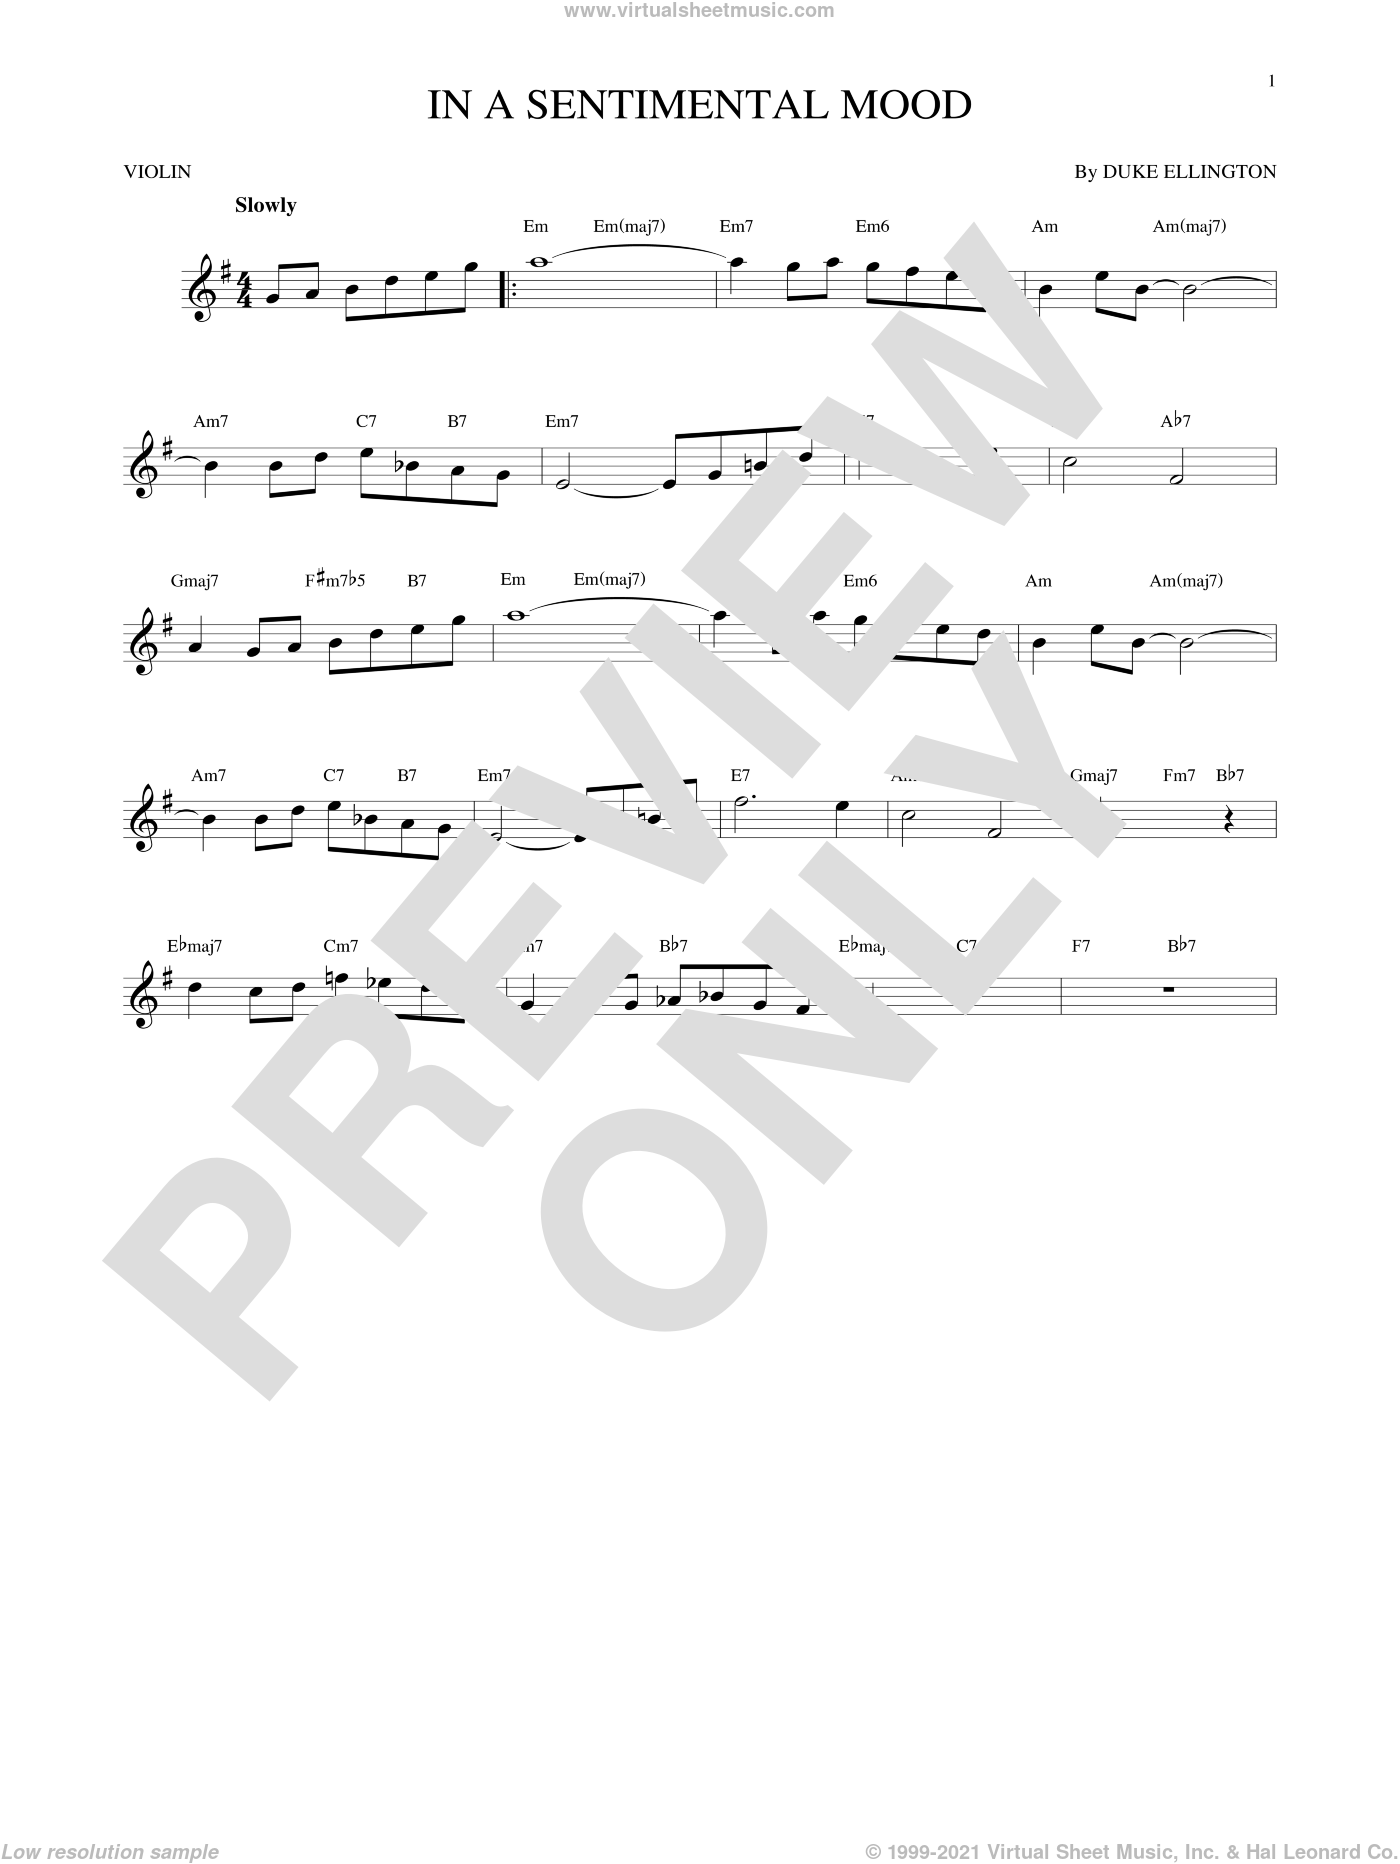 In A Sentimental Mood sheet music for violin solo by Duke Ellington, Irving Mills and Manny Kurtz, intermediate skill level